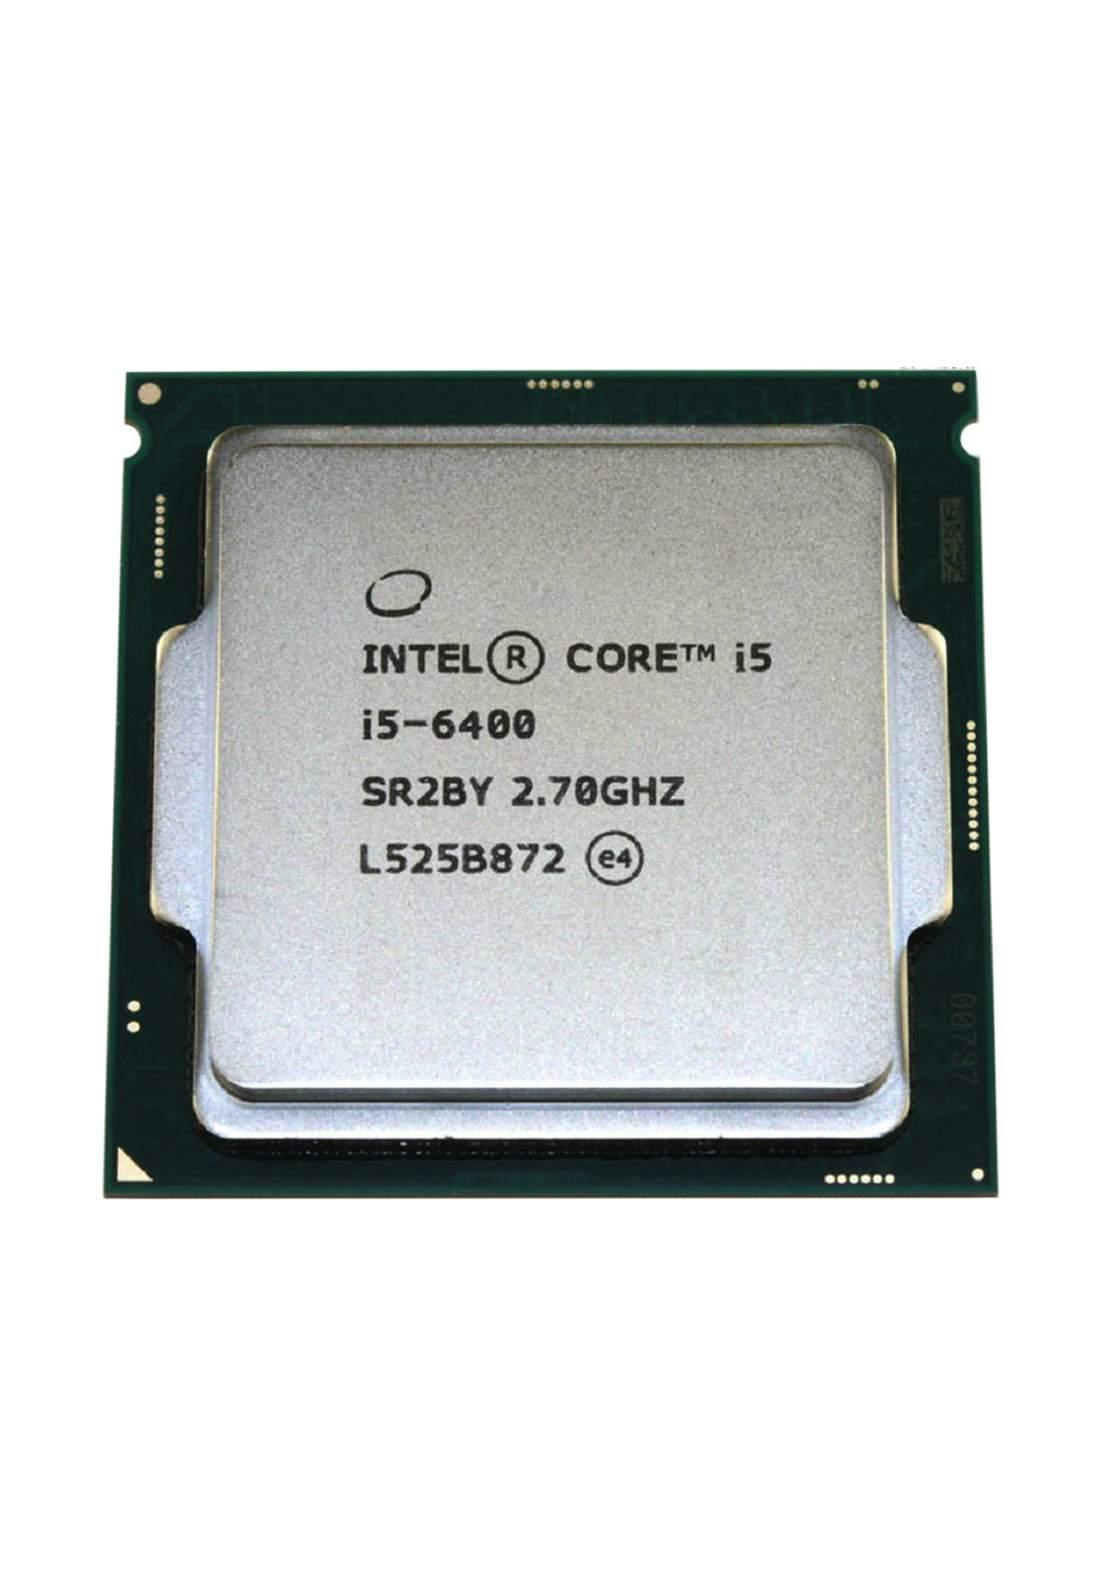 Intel Ci5 6400 Tray Packaging  Wholesale Processor معالج